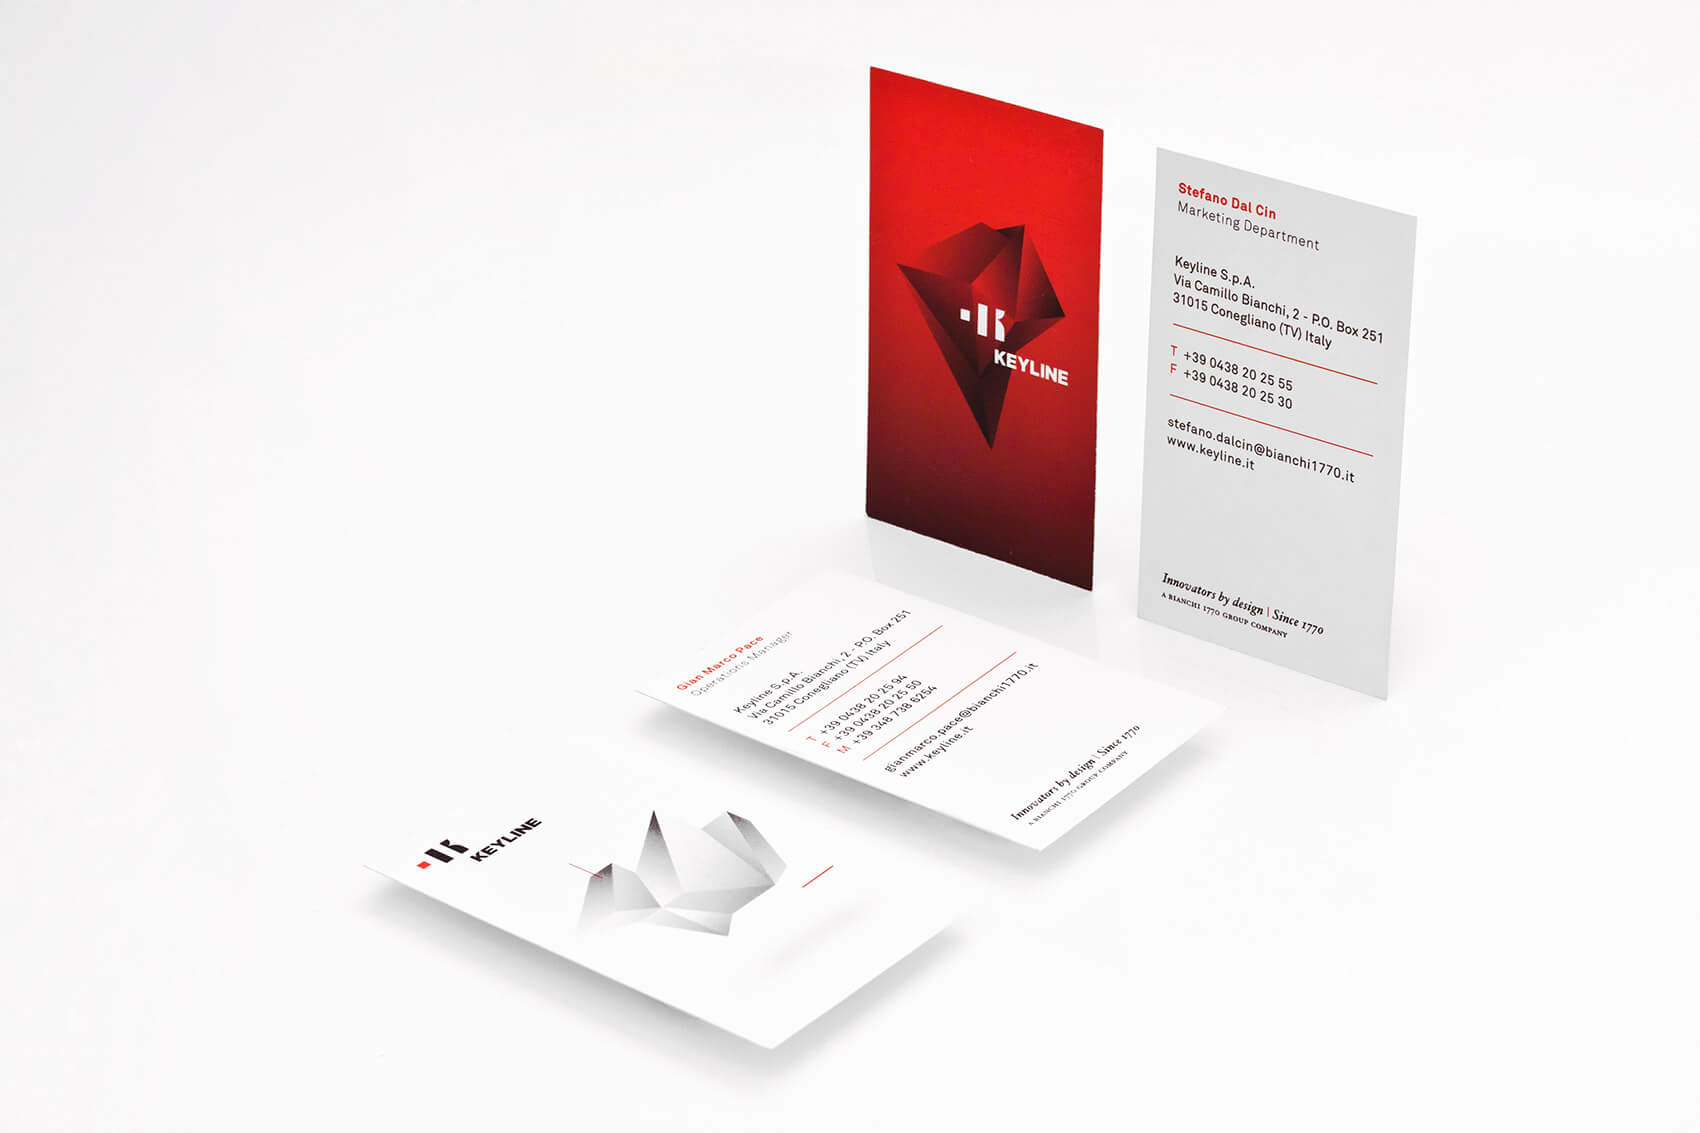 Keyline Business Cards